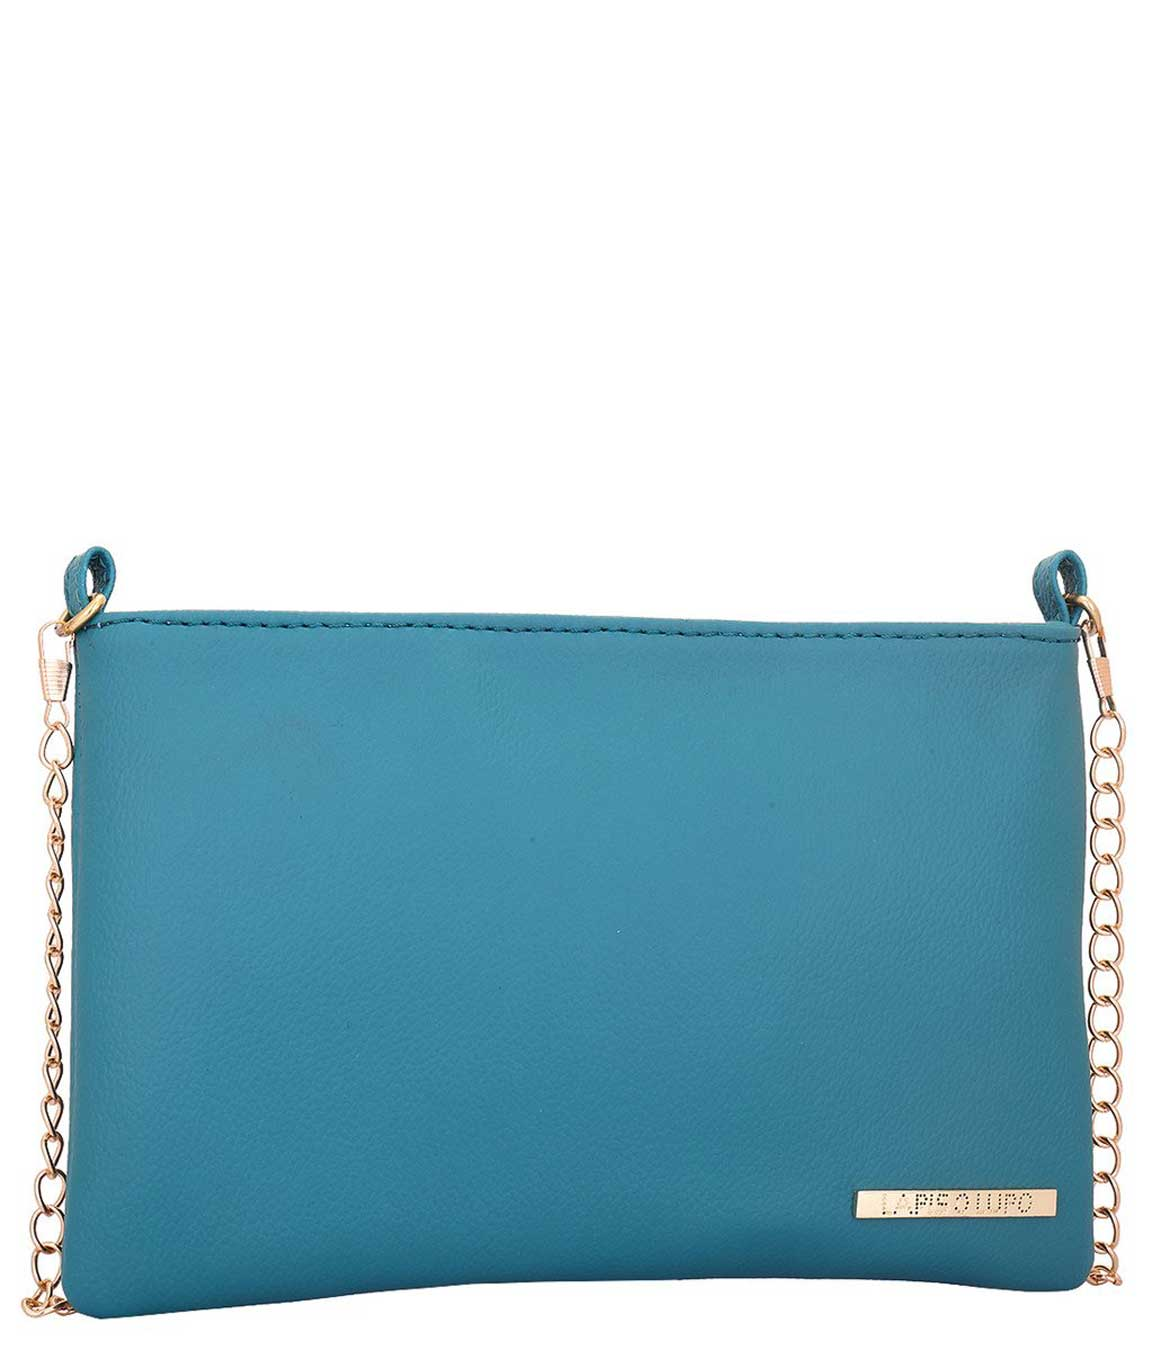 Lapis O Lupo Women`s PU Turquoise Sling Bag